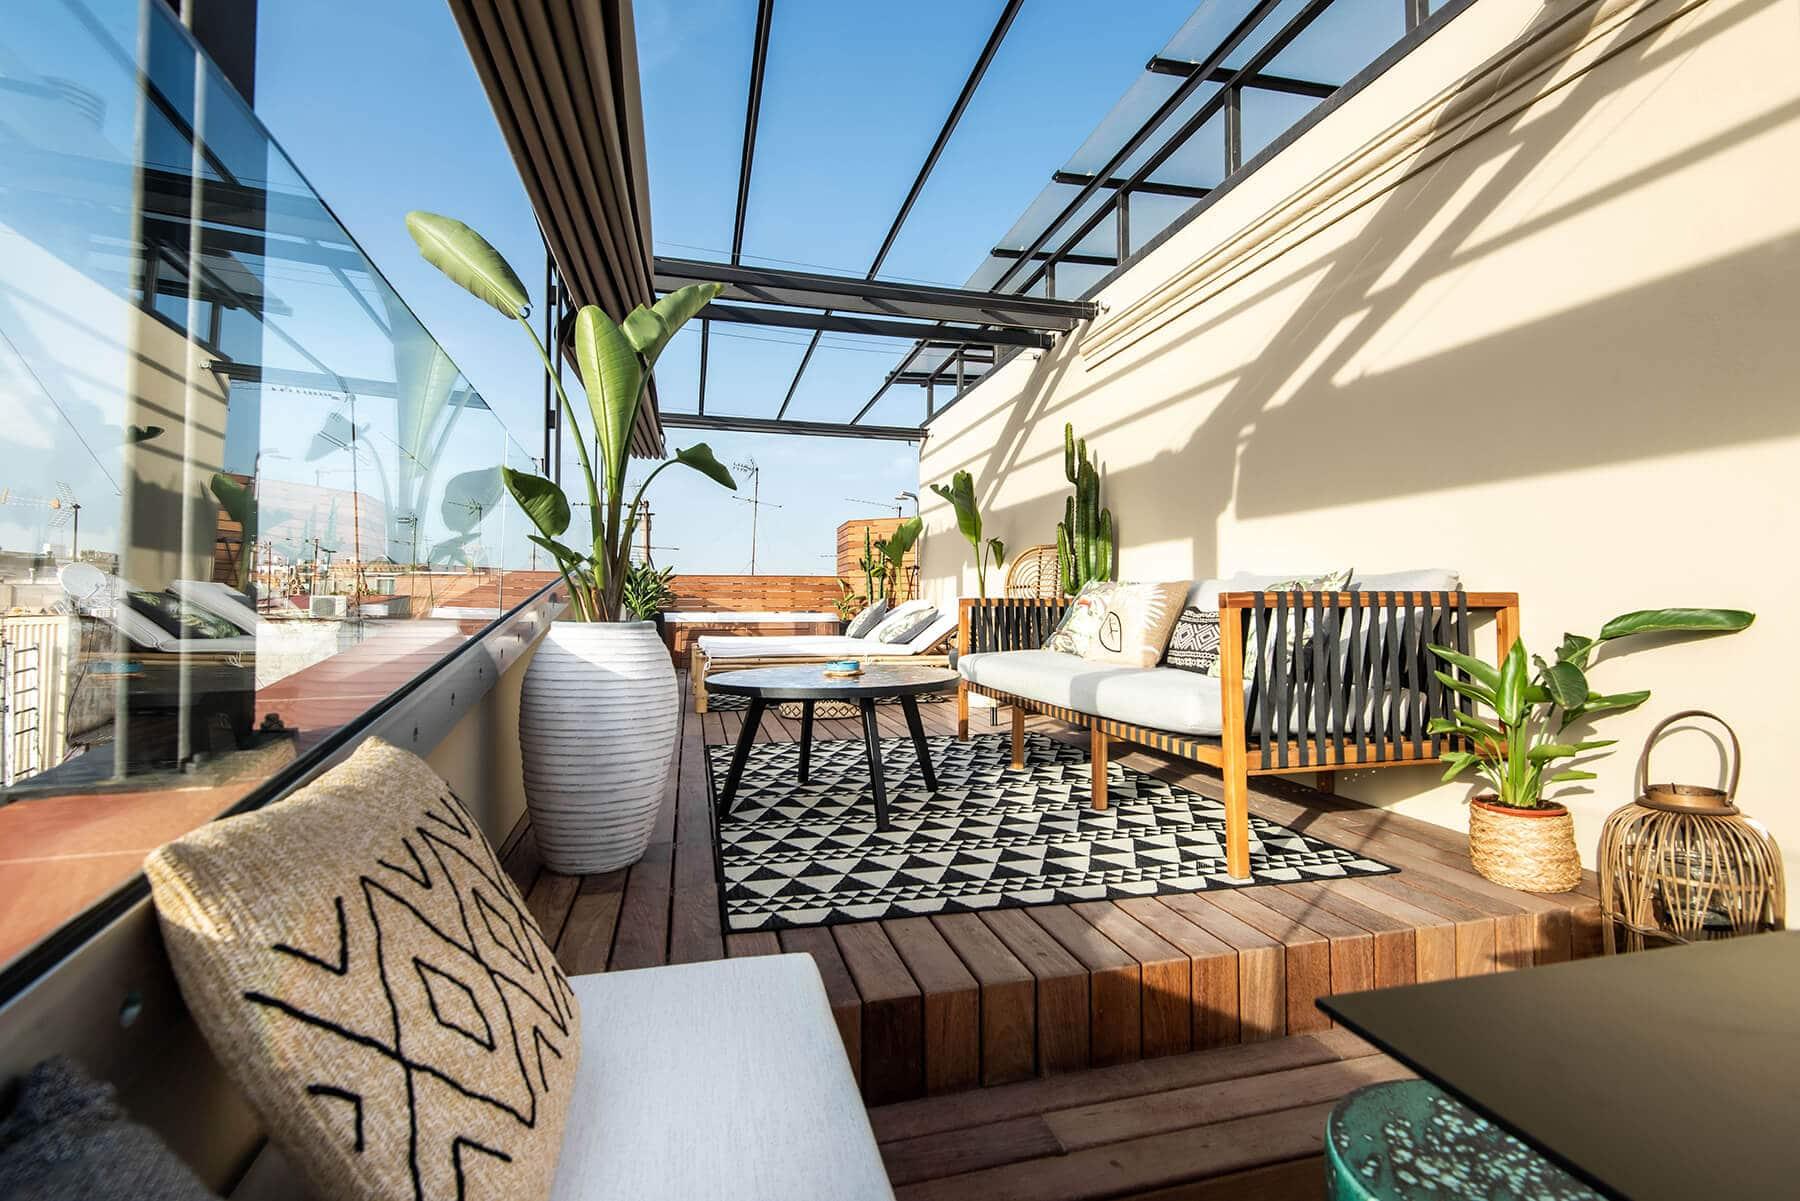 The importance of Interior Design 2